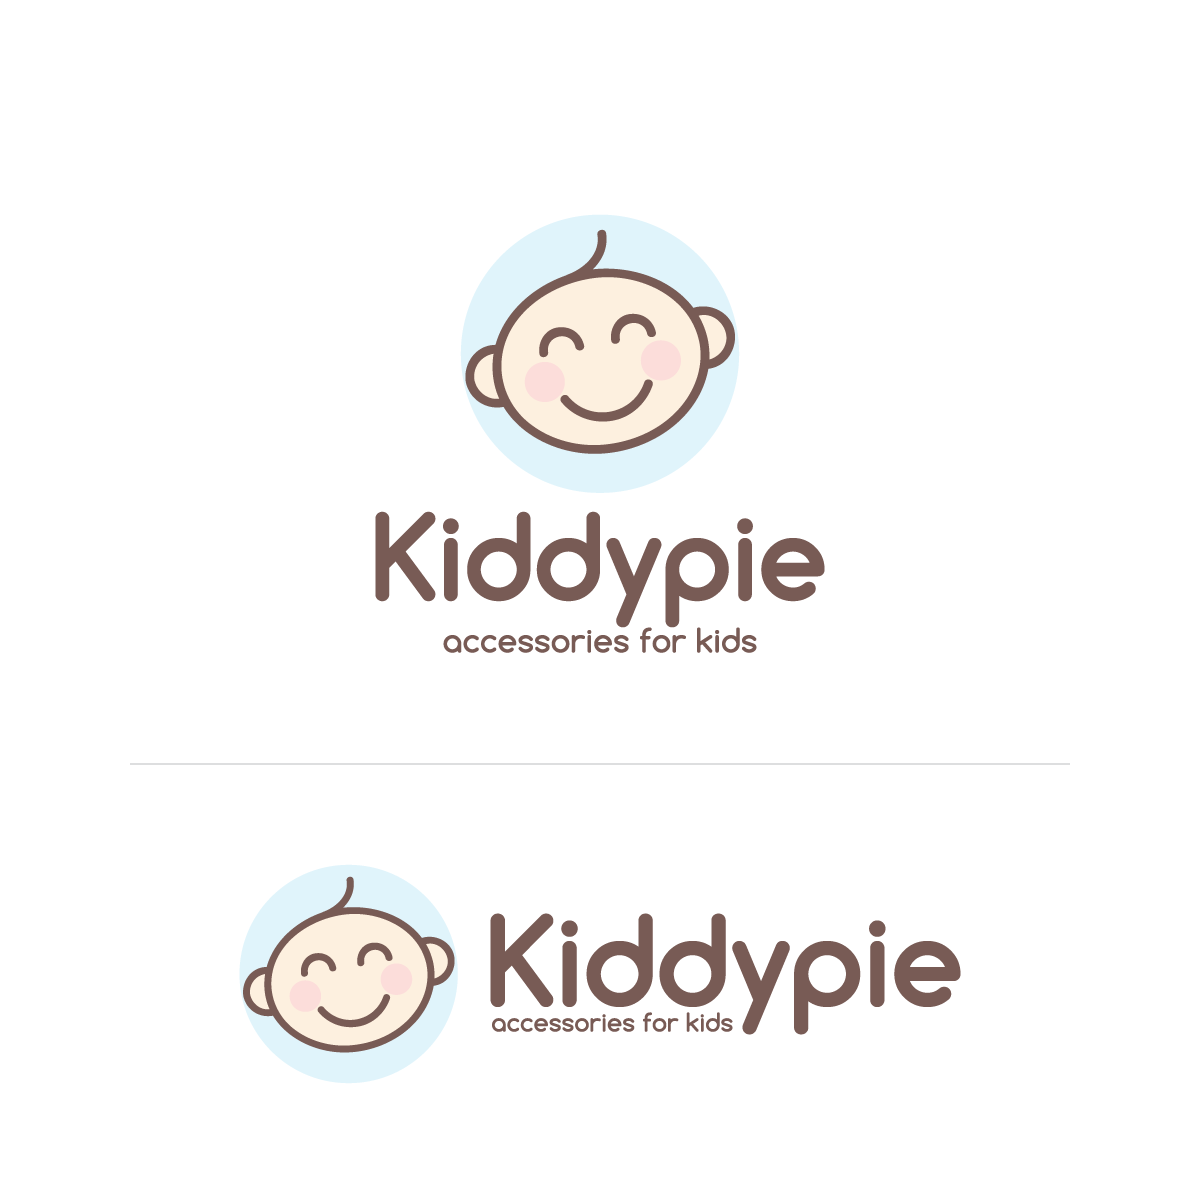 Kiddypie